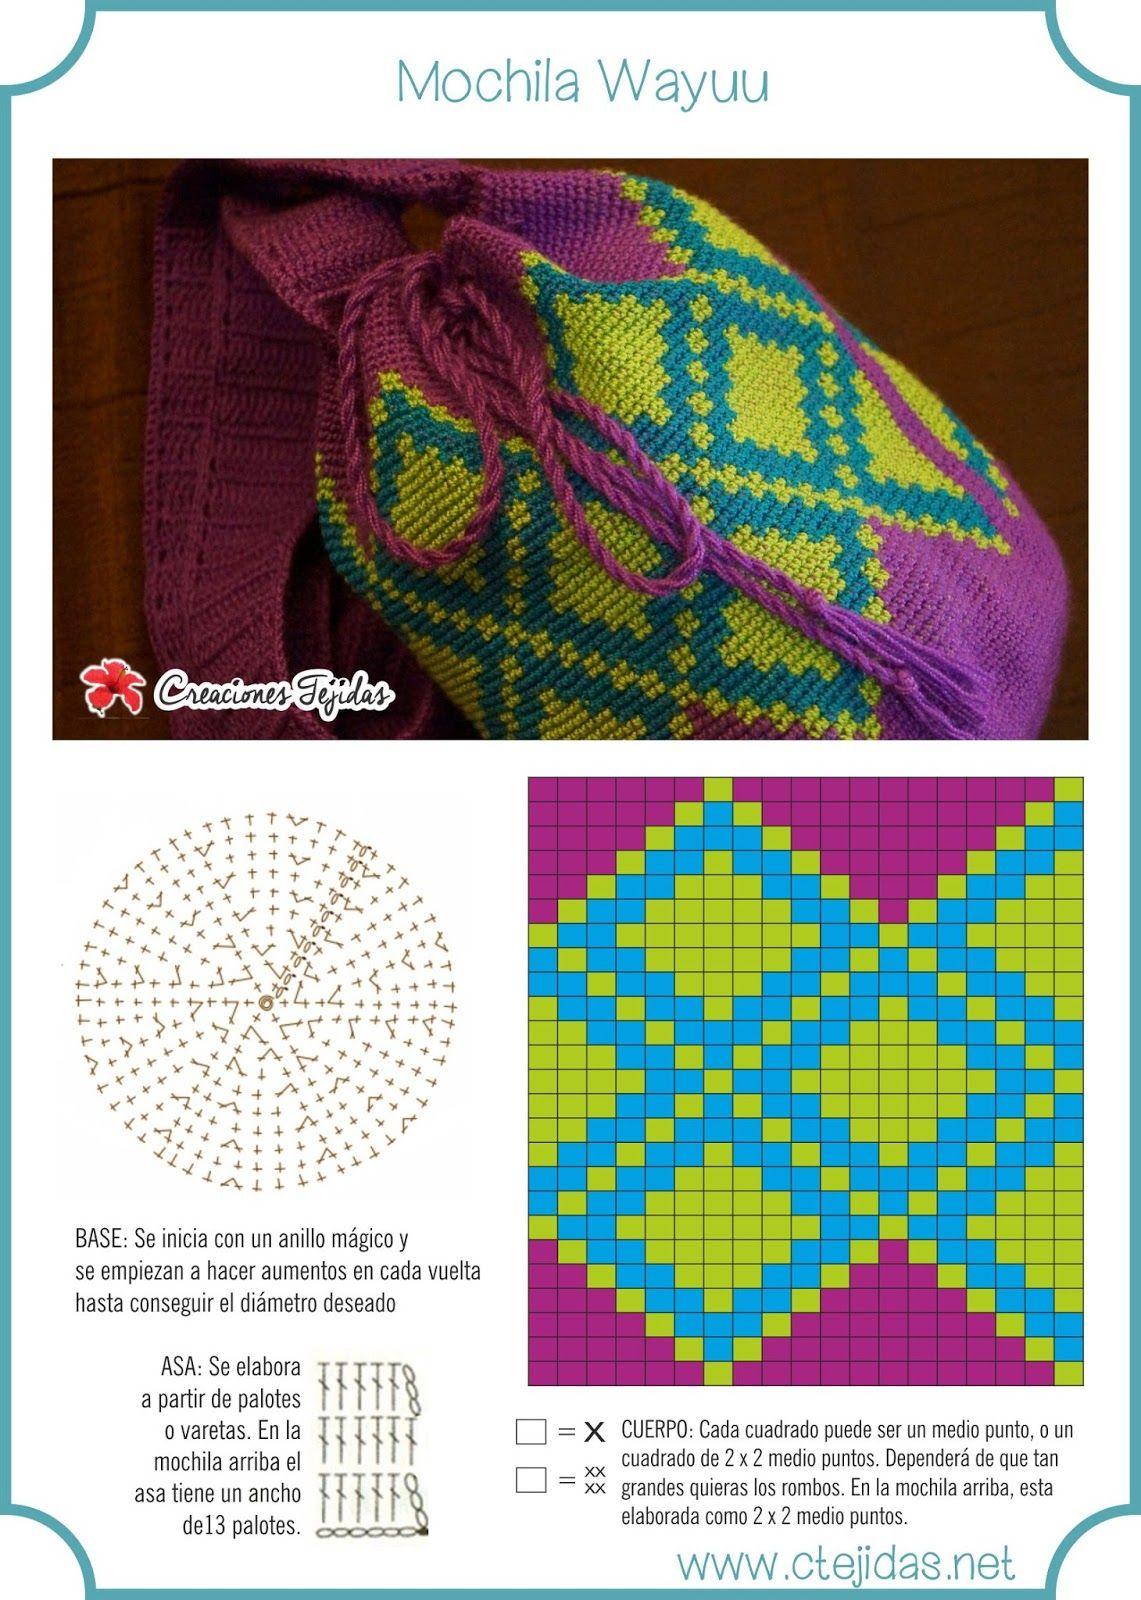 Patrón de Mochila Wayúu | mochilas | Pinterest | Patrón de mochila ...